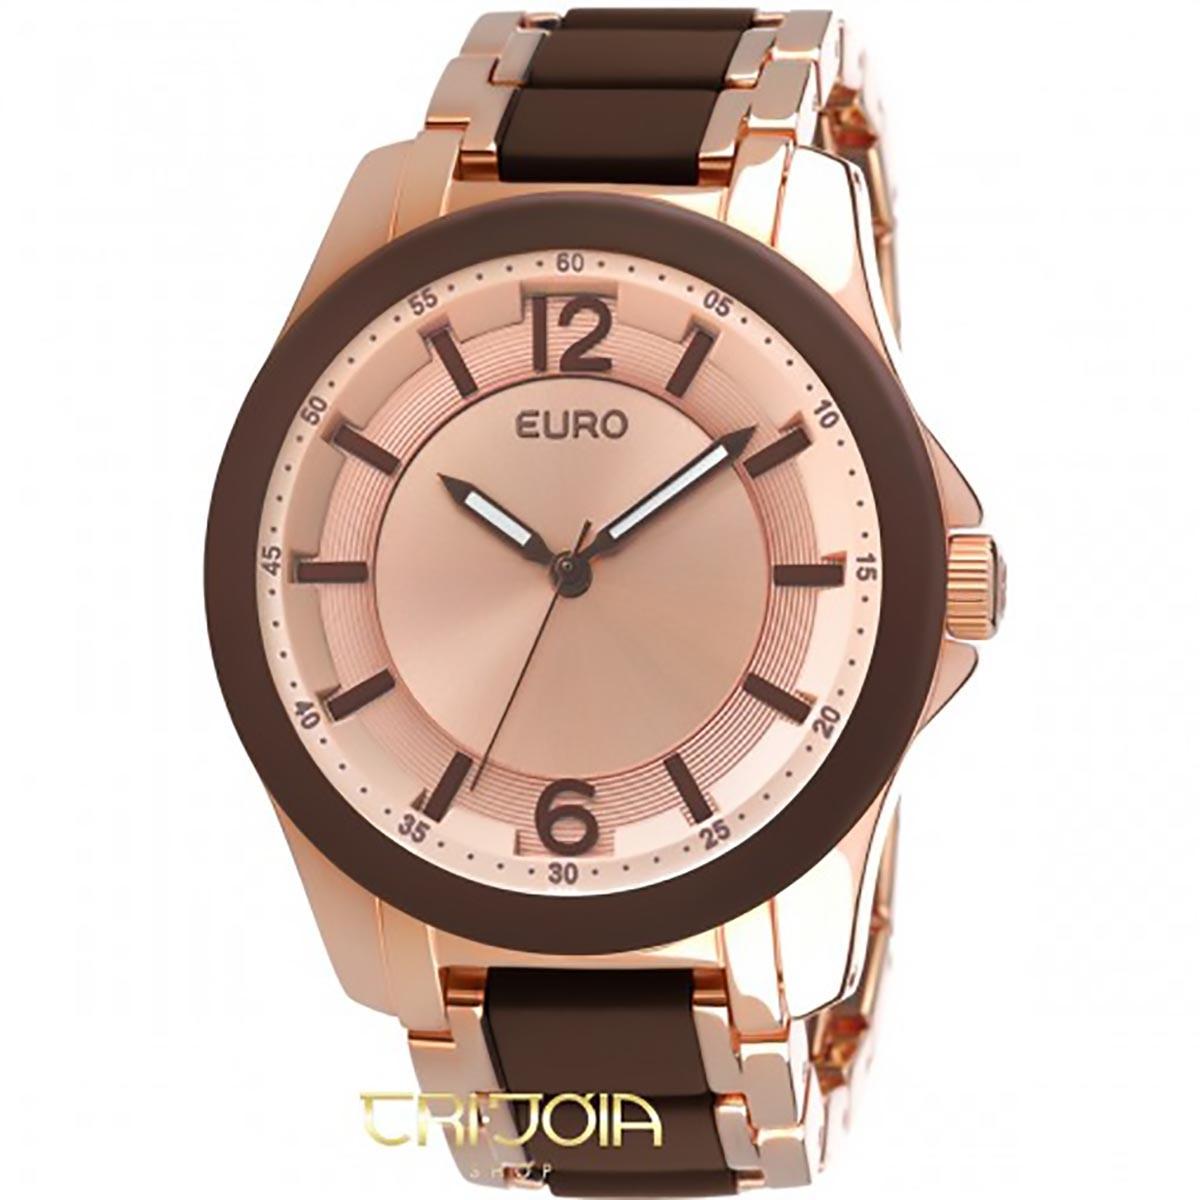 Relógio Euro Rose Gold Kiev EU2035FGN 4M 5f362ba97c